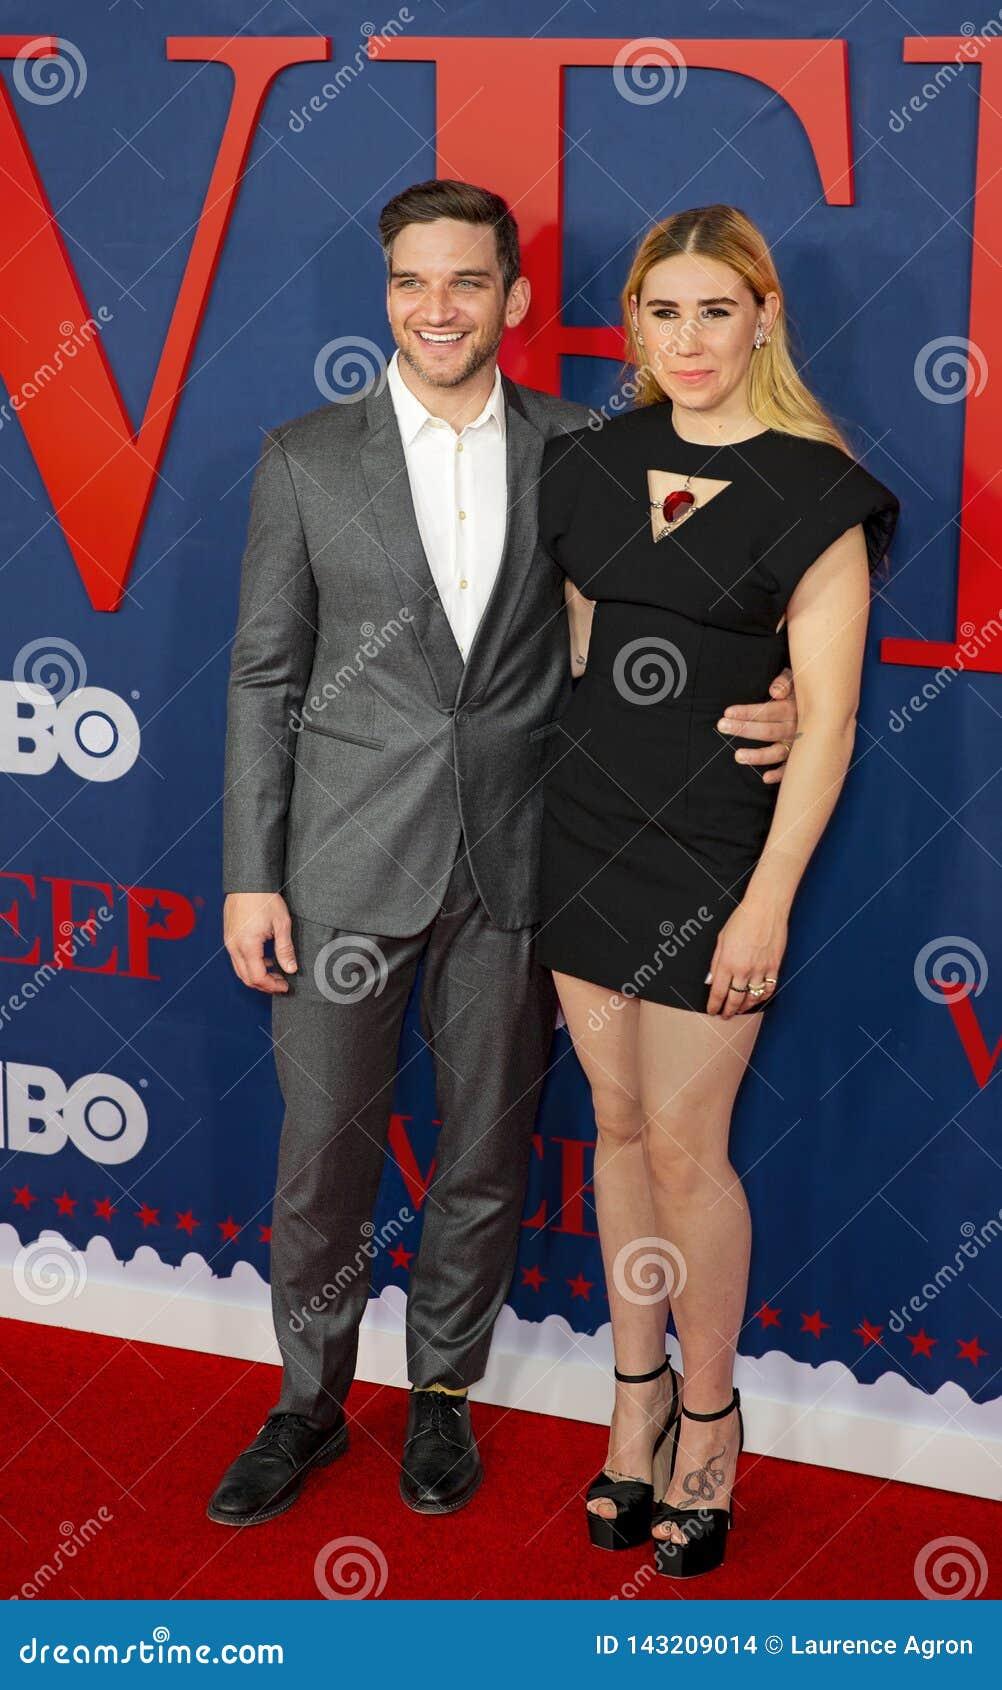 Evan Jonigkeit And Zosia Mamet At Premiere Of VEEP Final